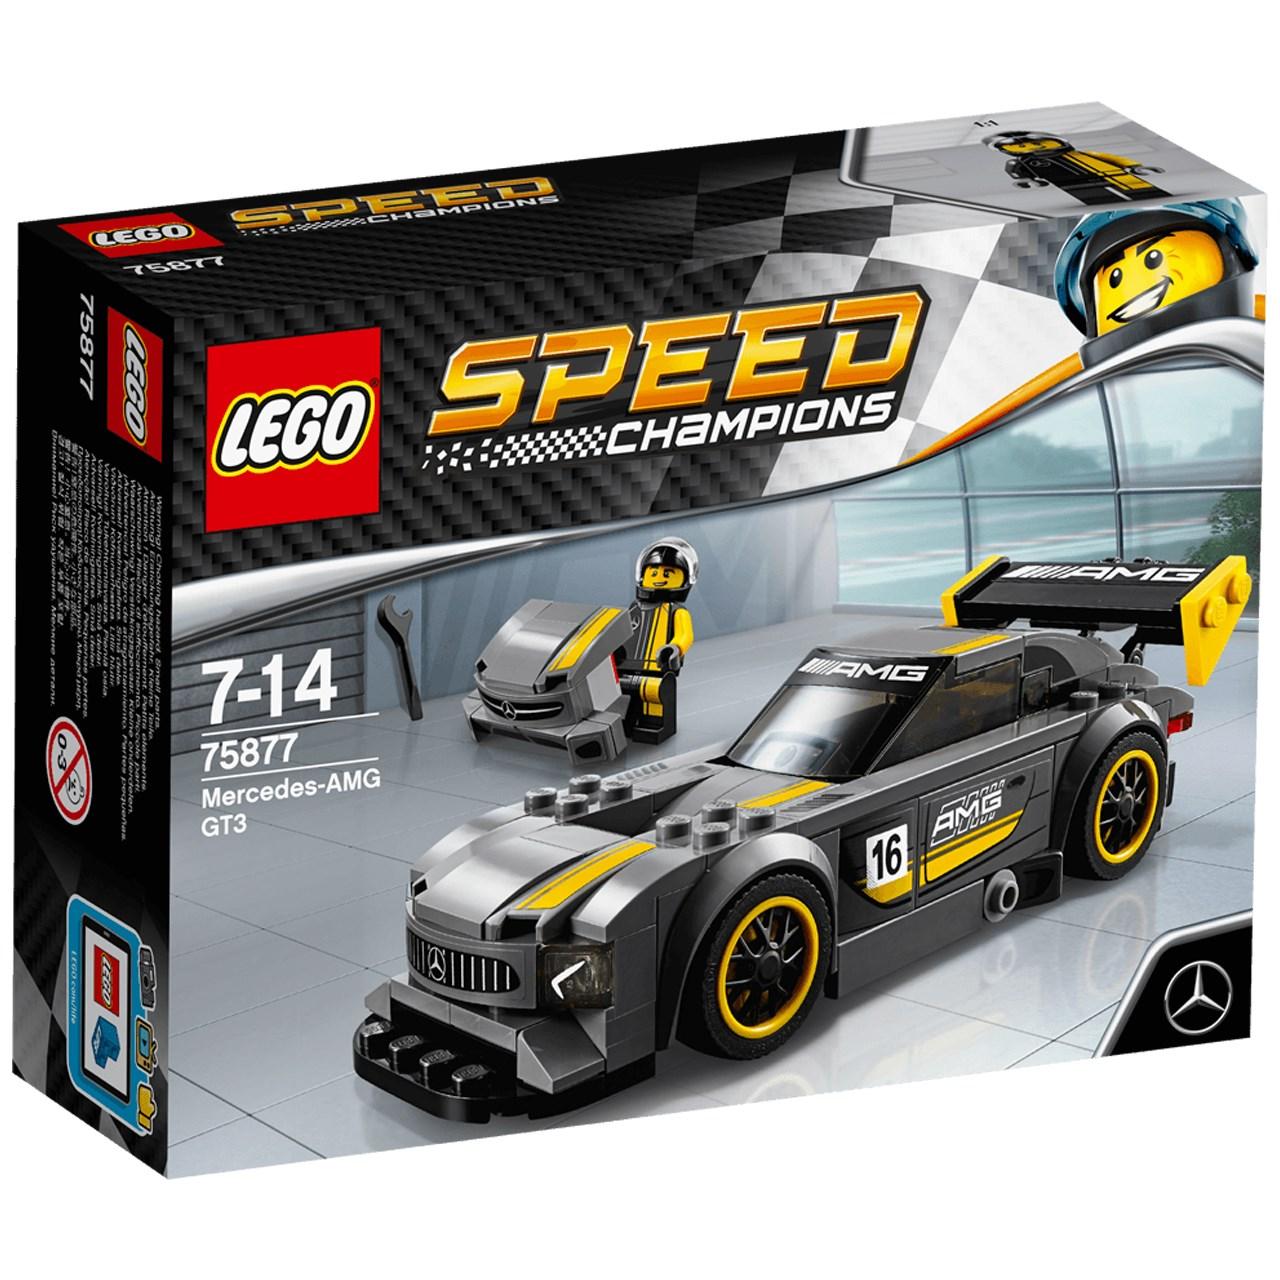 لگو سری Speed مدل Mercedes AMG GT3 75877